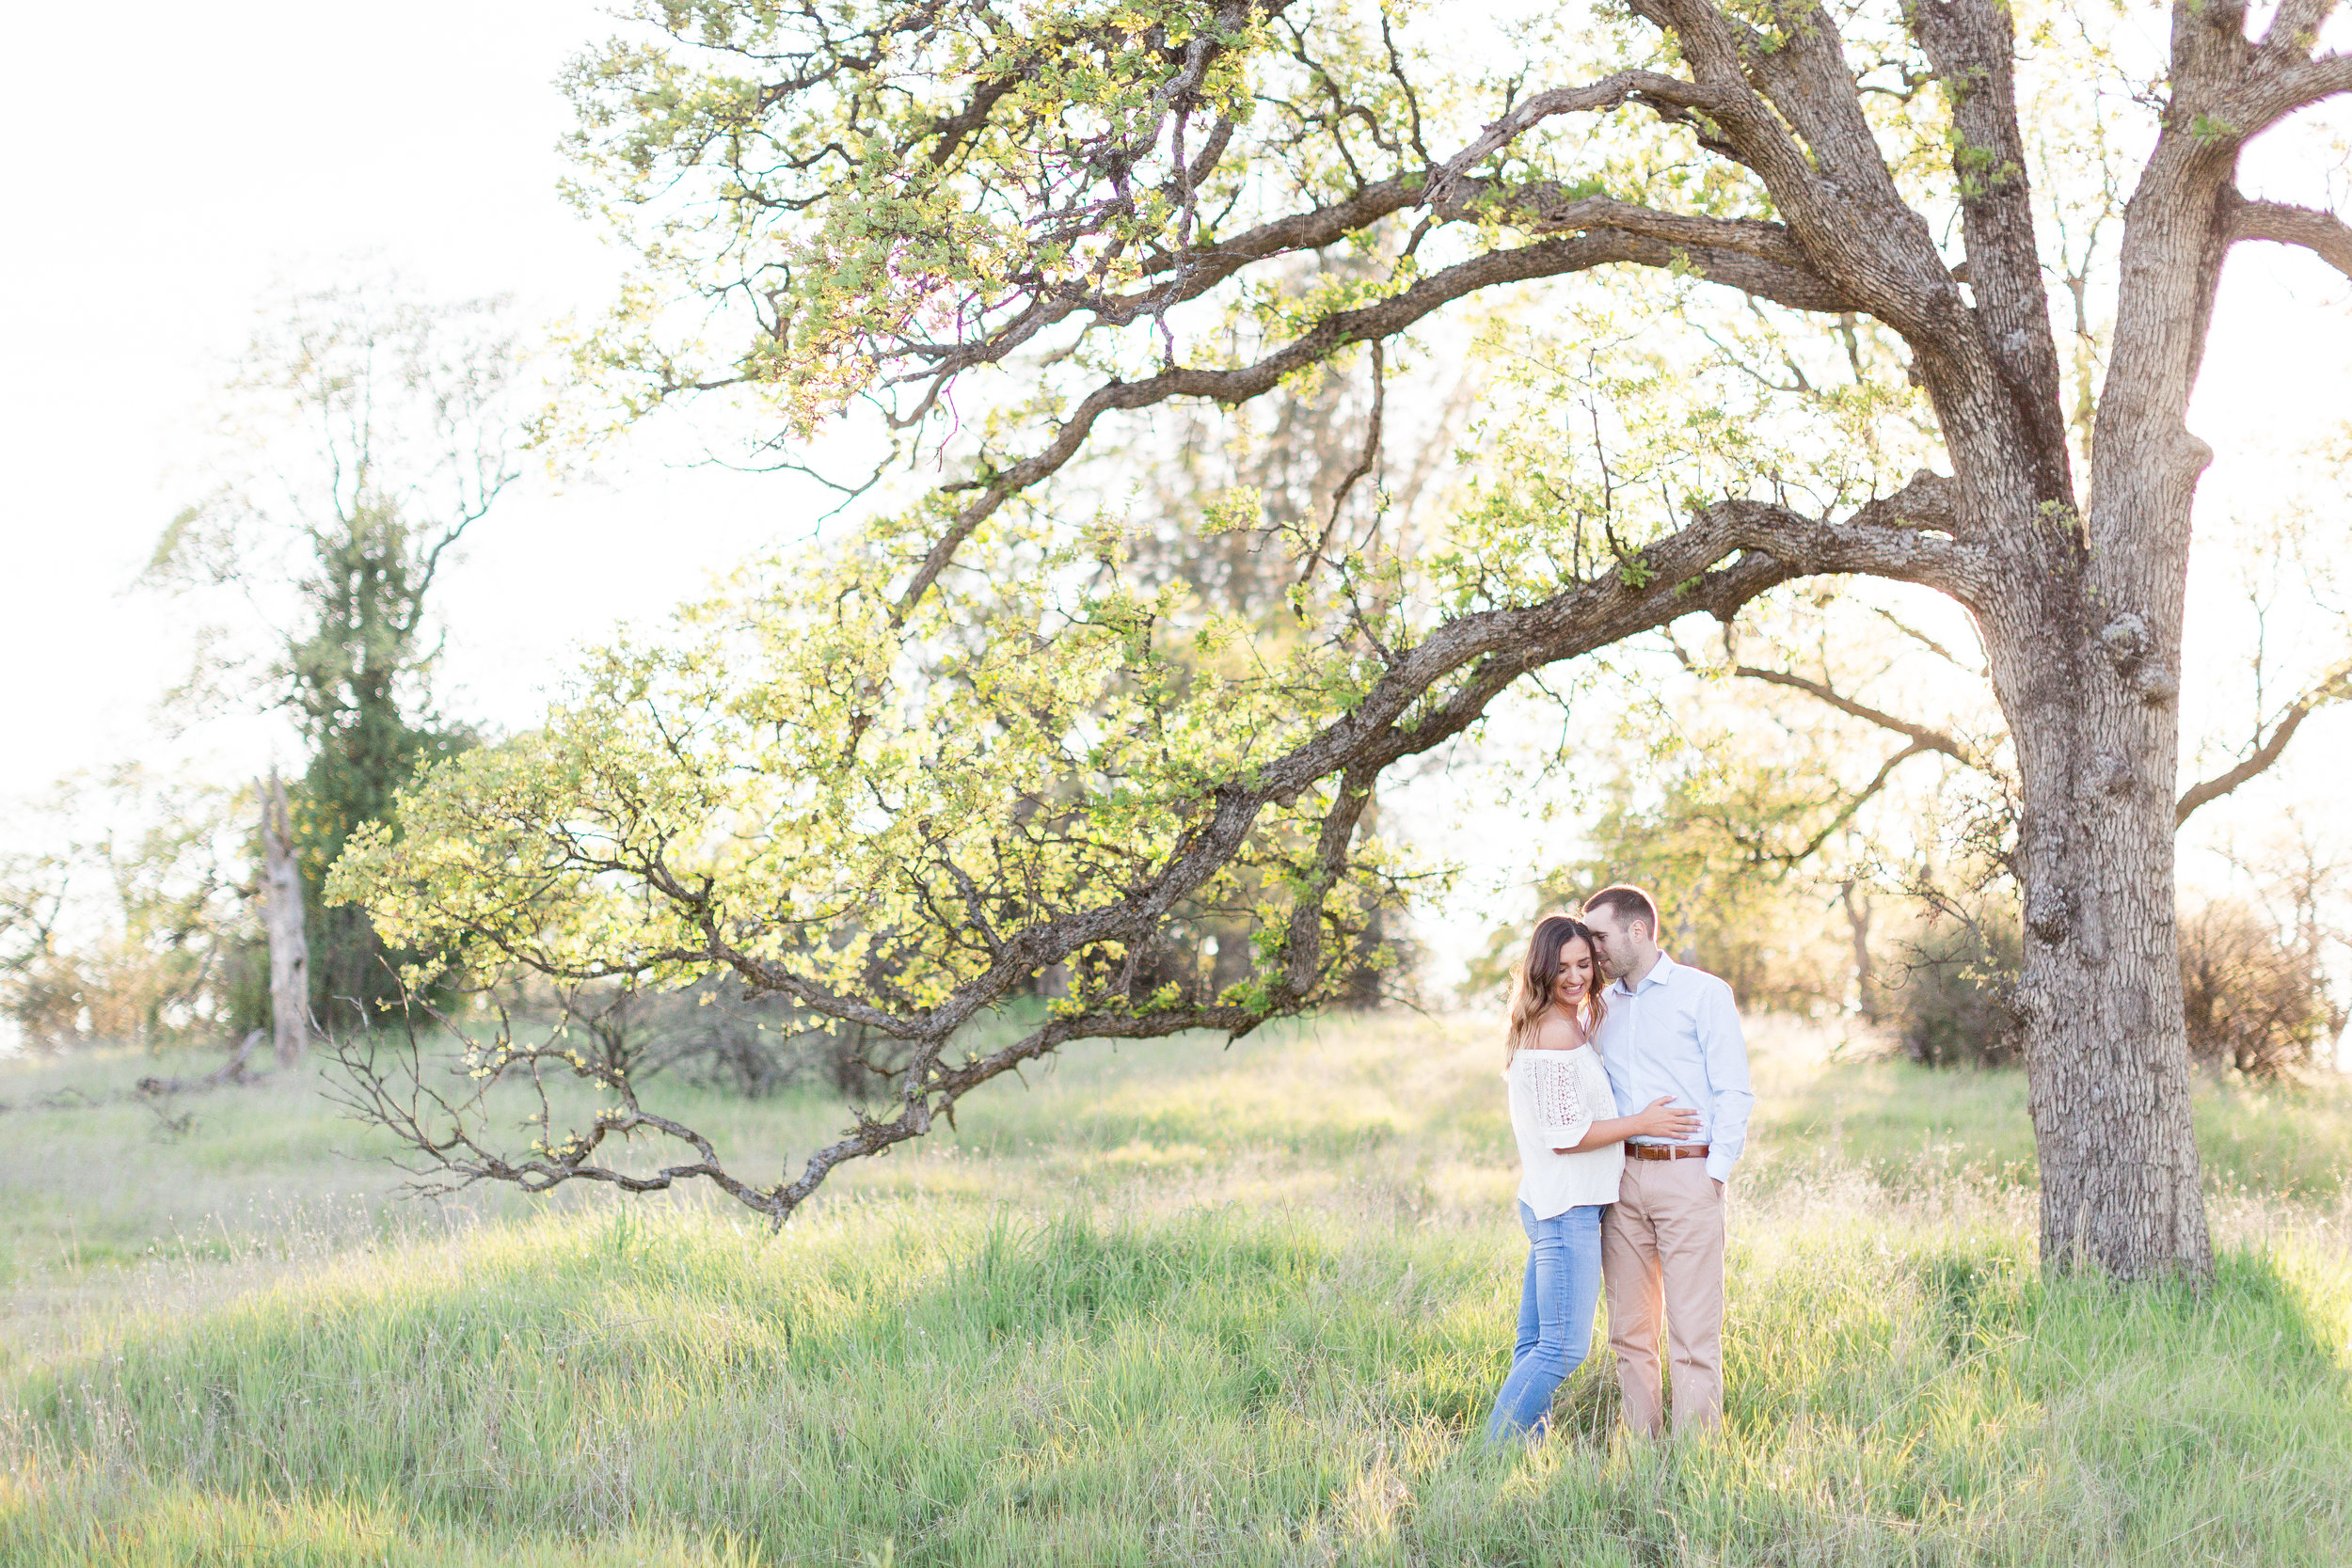 Upper-Park-Chico-Engagement-Photos-59.jpg